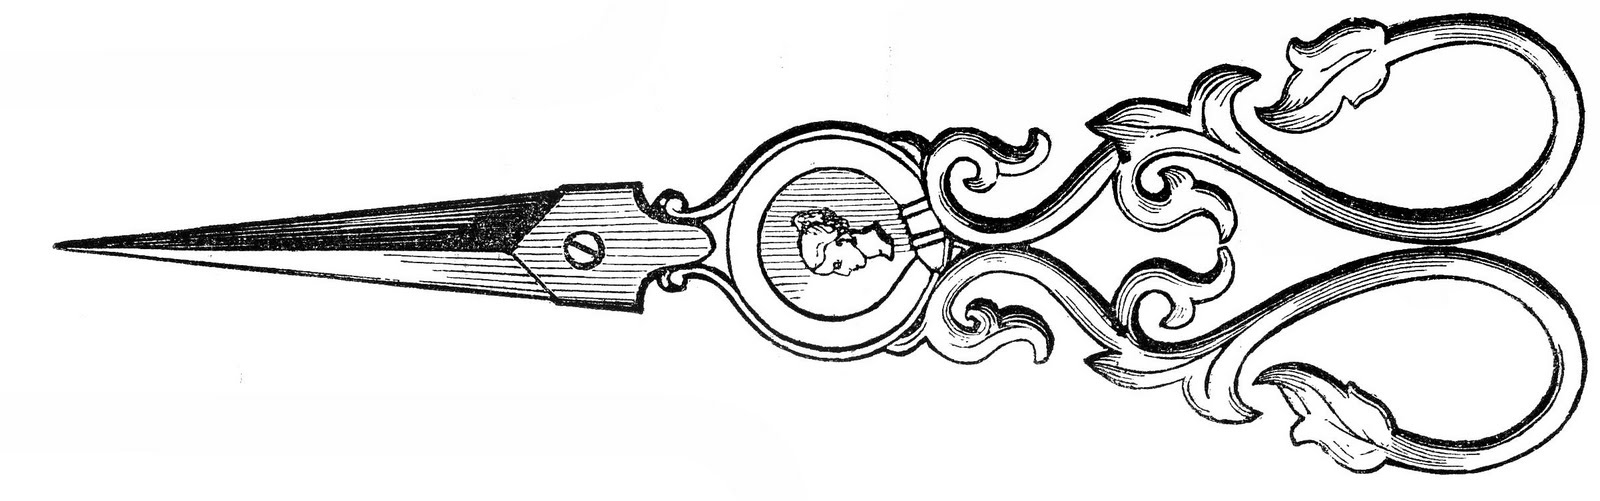 scissors graphics the. Shears clipart ornate